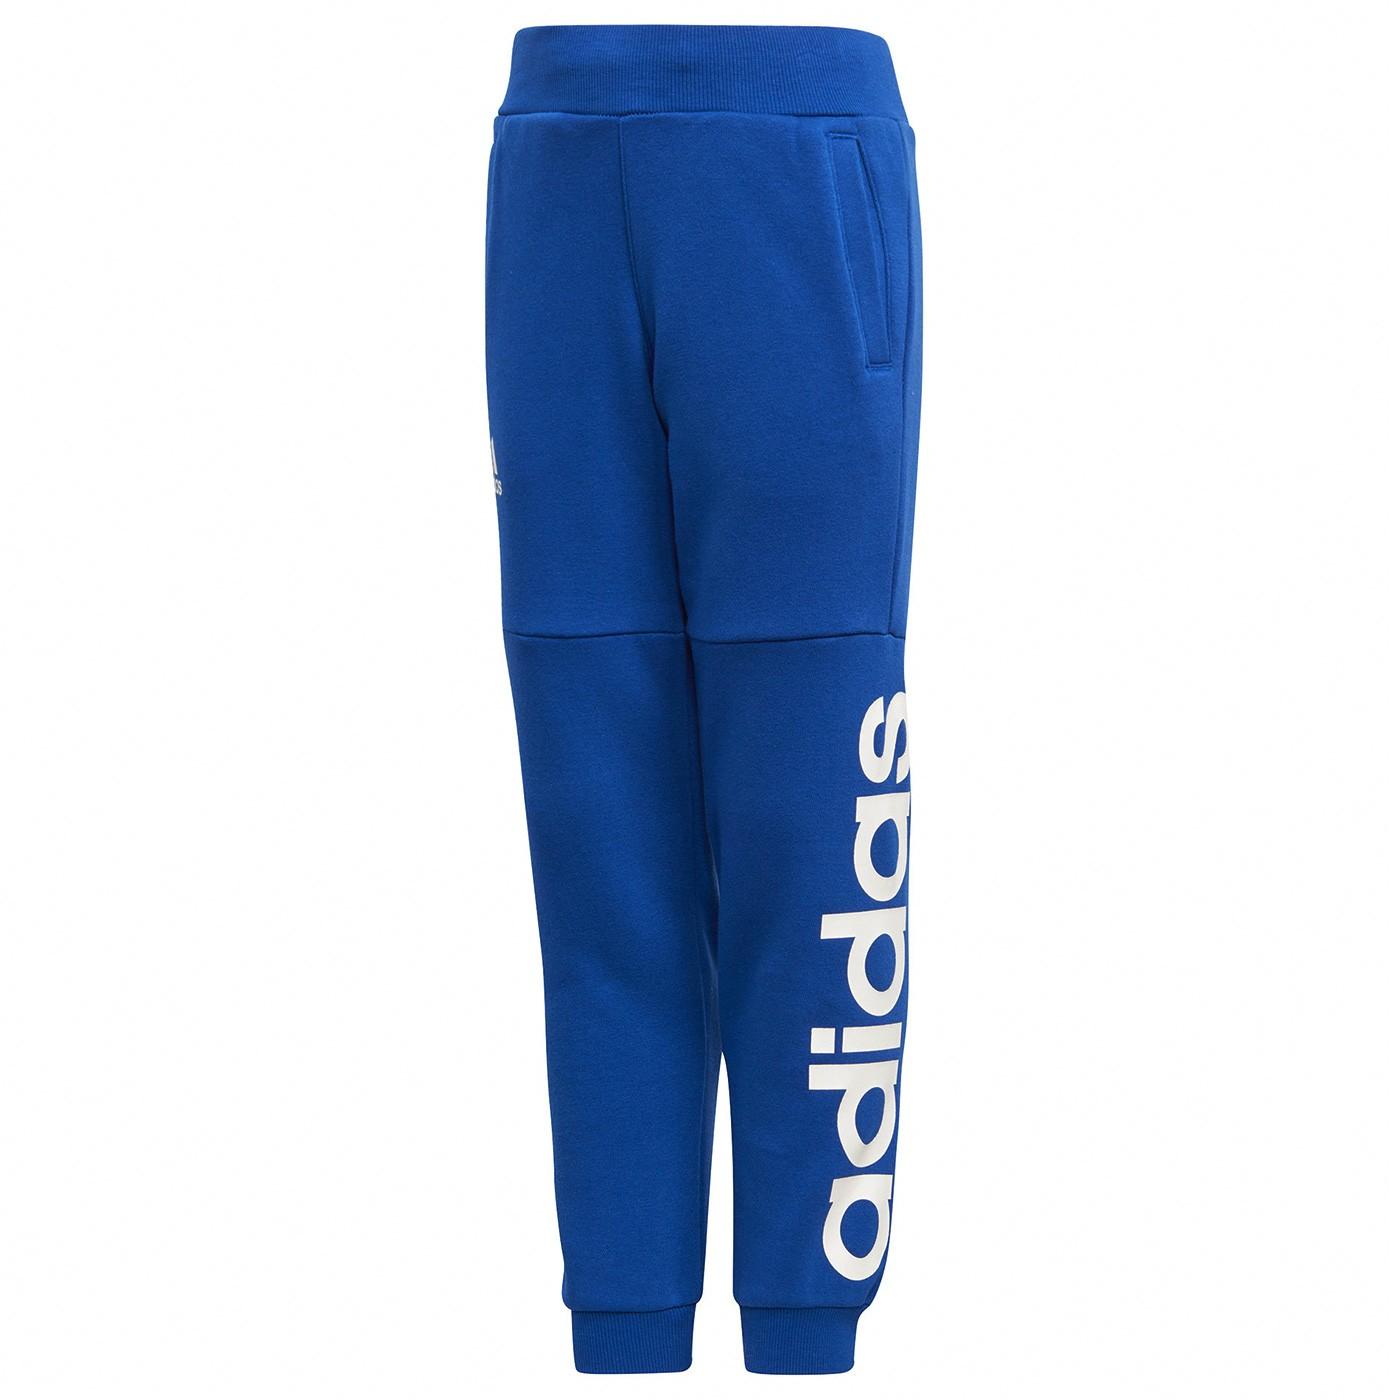 a20505759f597 Pantaloni tuta Adidas Linear Bambino - Abbigliamento fitness